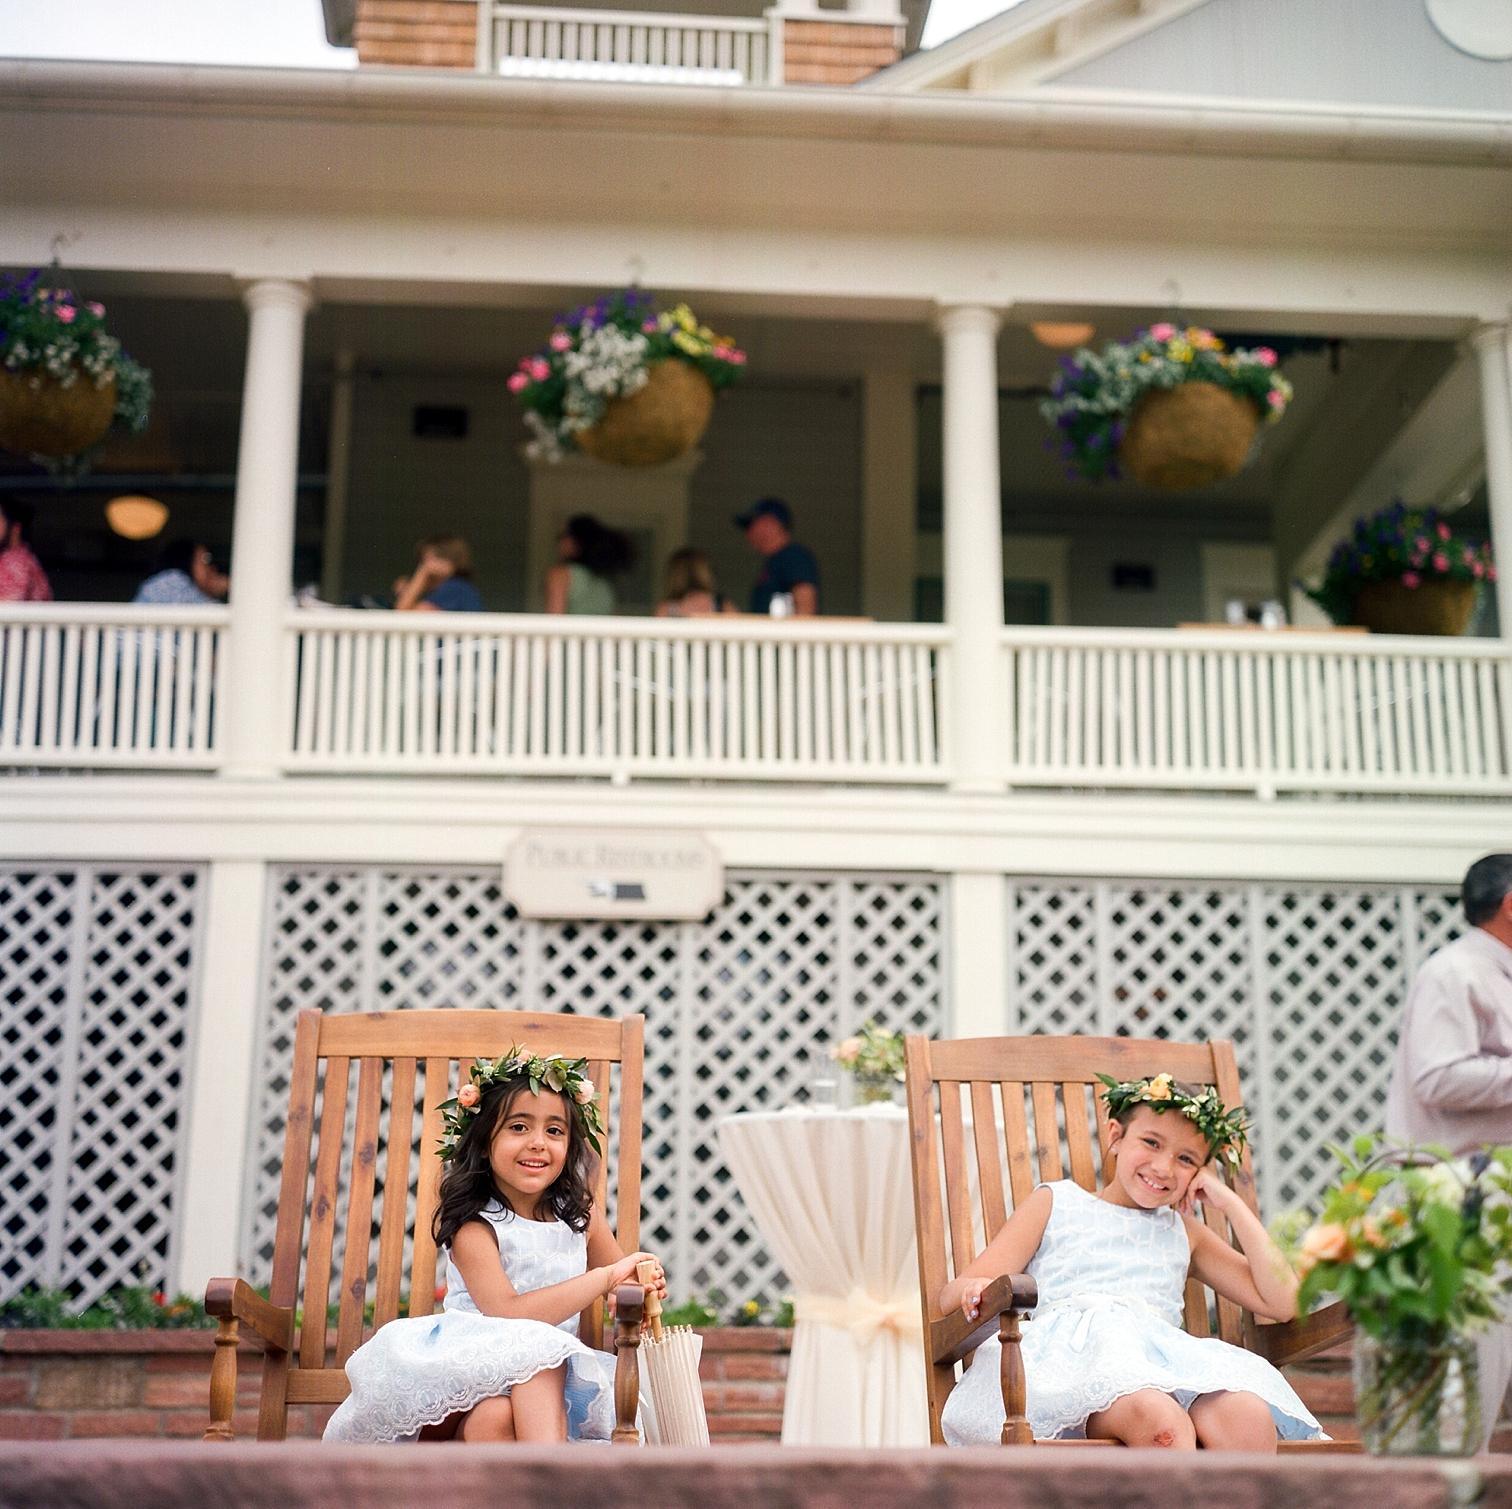 Chautauqua Dining Hall Wedding, Outdoor Wedding Details, Colorado Mountain Weddings, Danielle DeFiore Photographer, Destination Wedding Photographers, Weddings in Boulder Colorado, Outdoor Ceremony, Film Photographer, Summer Weddings, Flowergirls